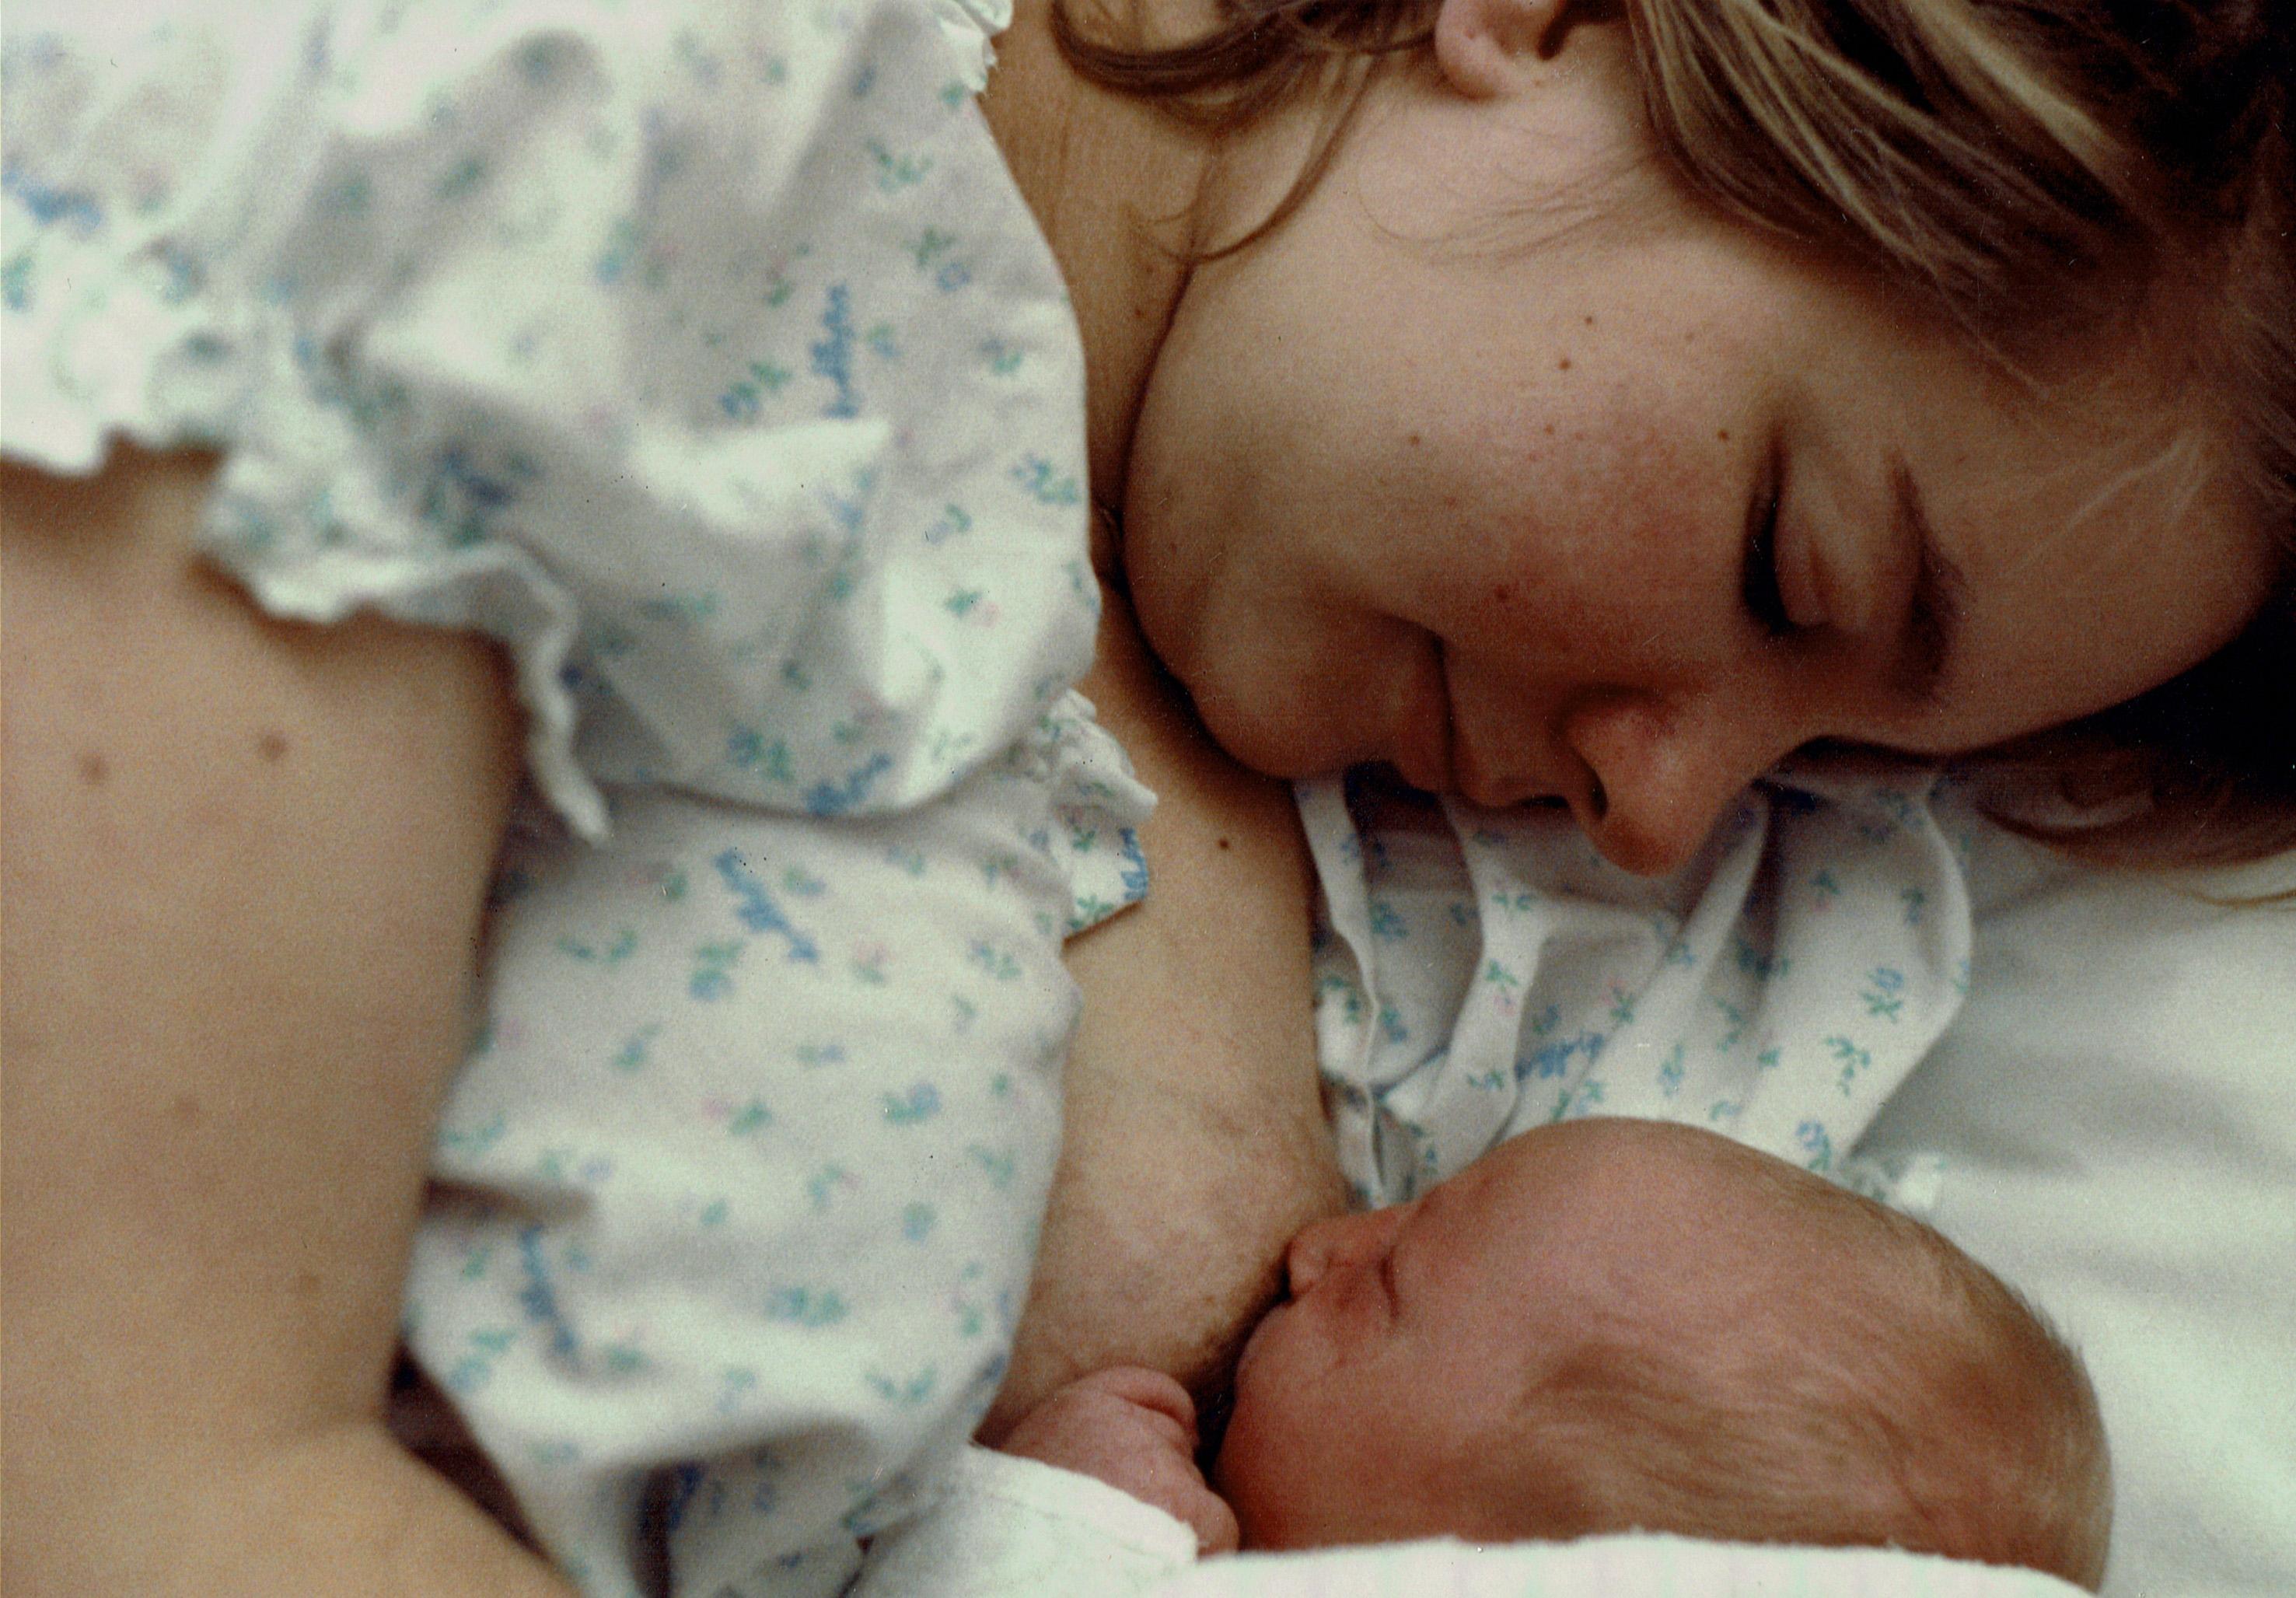 birth photograph 1991